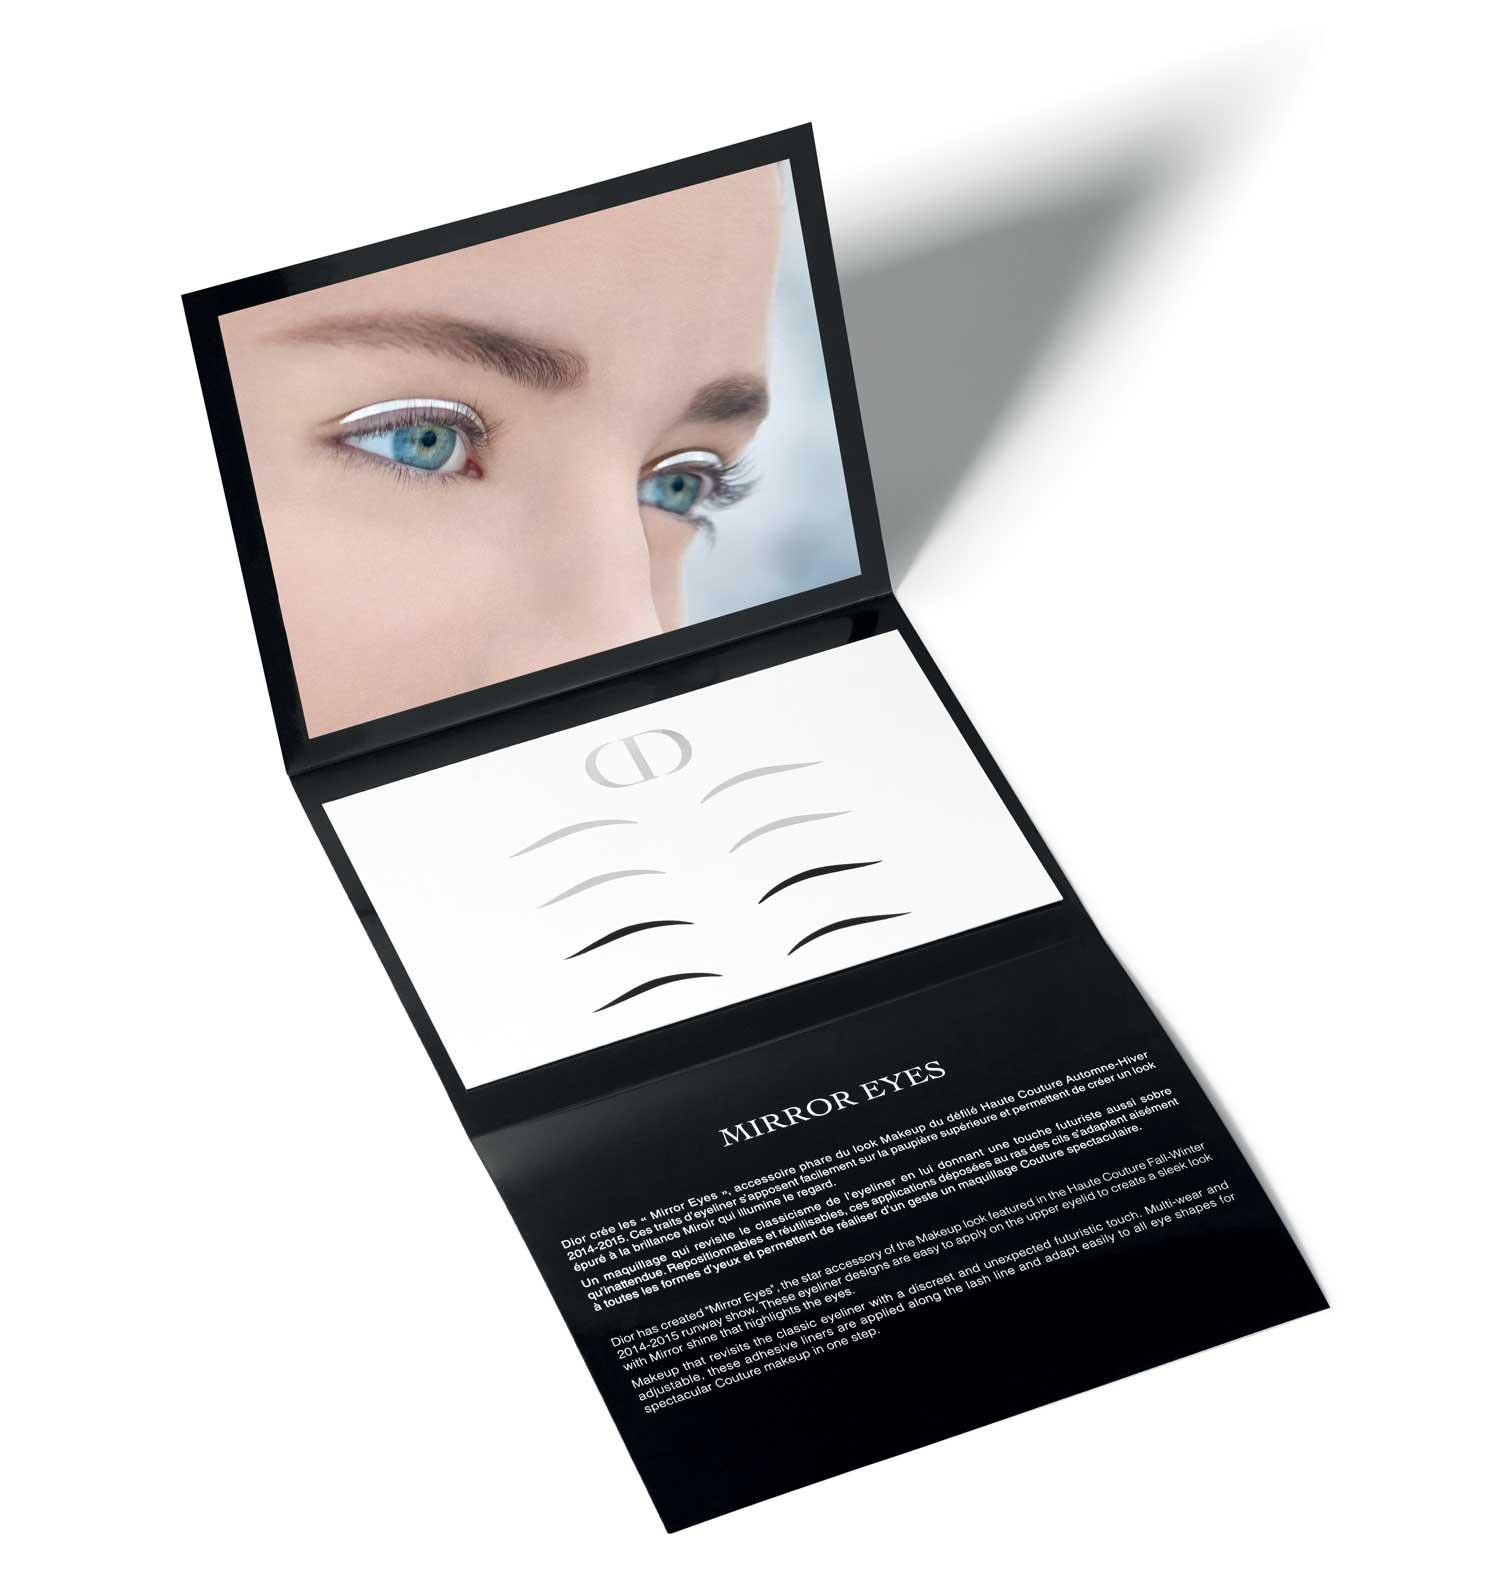 Dior_Mirror_Eyes_1_web